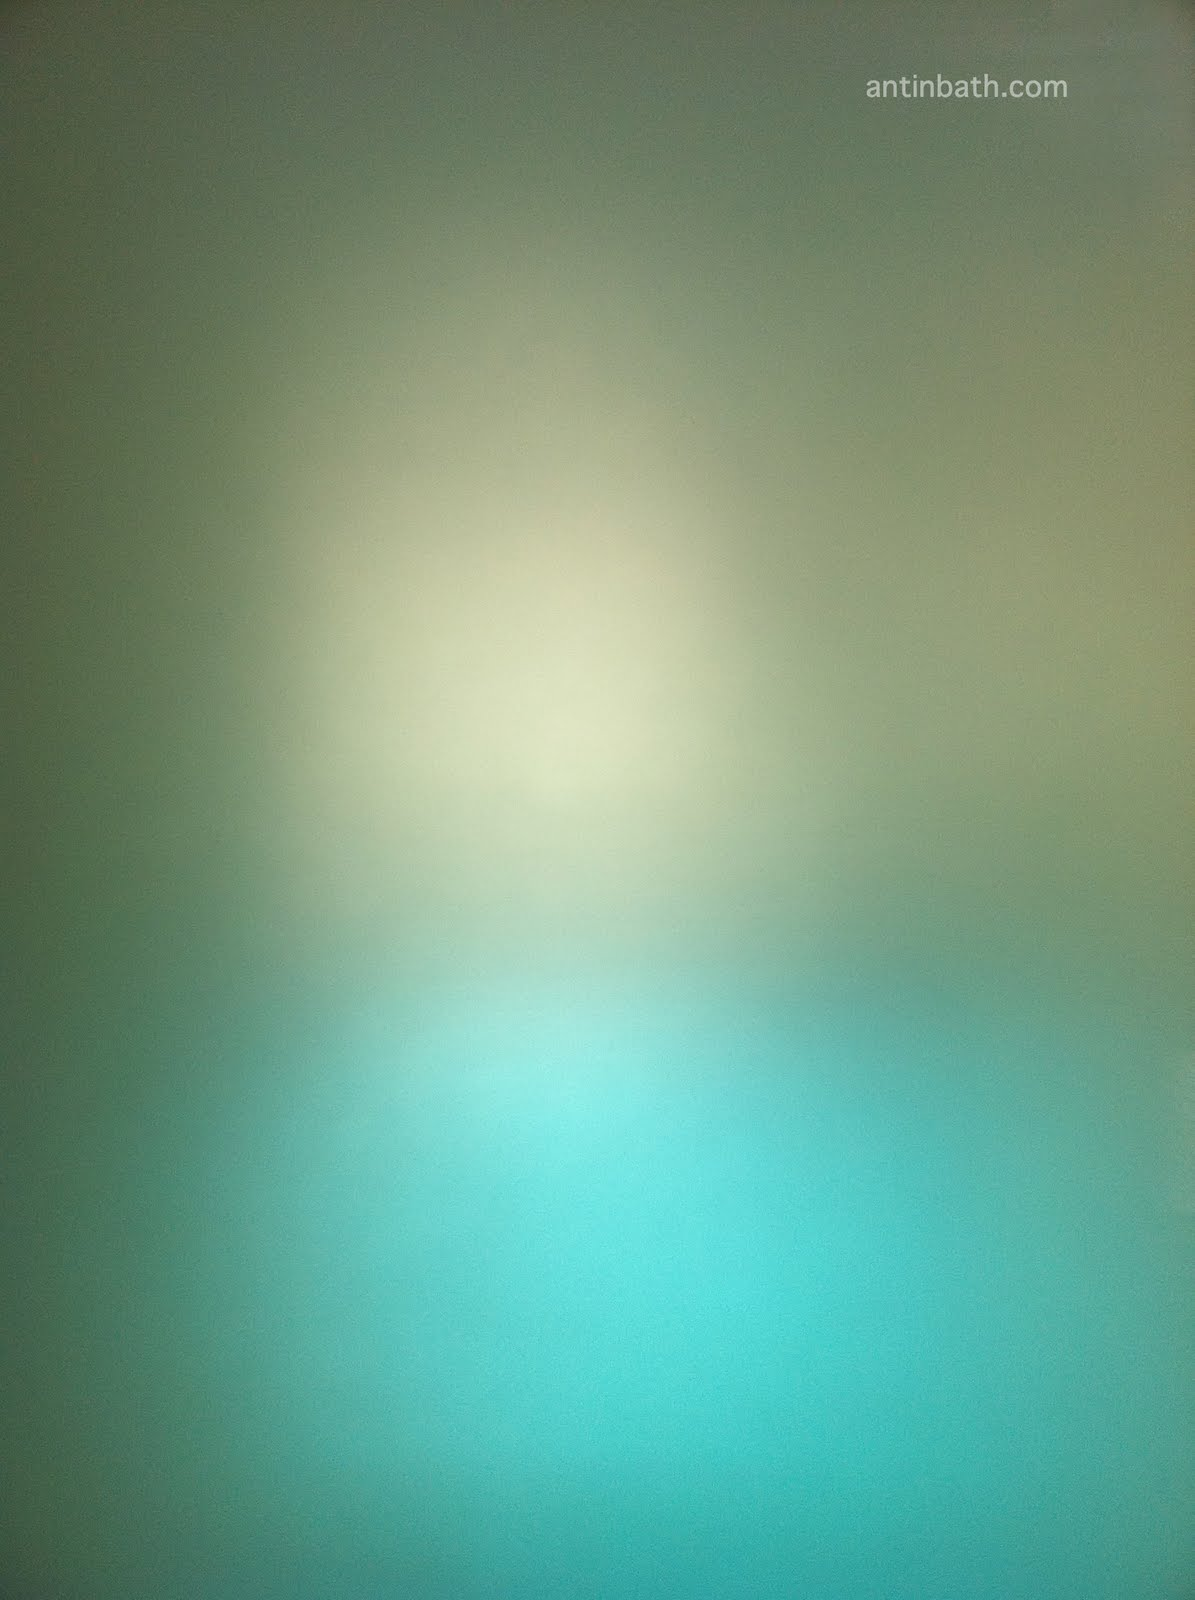 http://4.bp.blogspot.com/_BWeFvHW8_hE/TCpgZYw-9wI/AAAAAAAAAdI/KZJcEkKrLxg/s1600/antinbath-free-iphone4-wallpaper-3.jpg